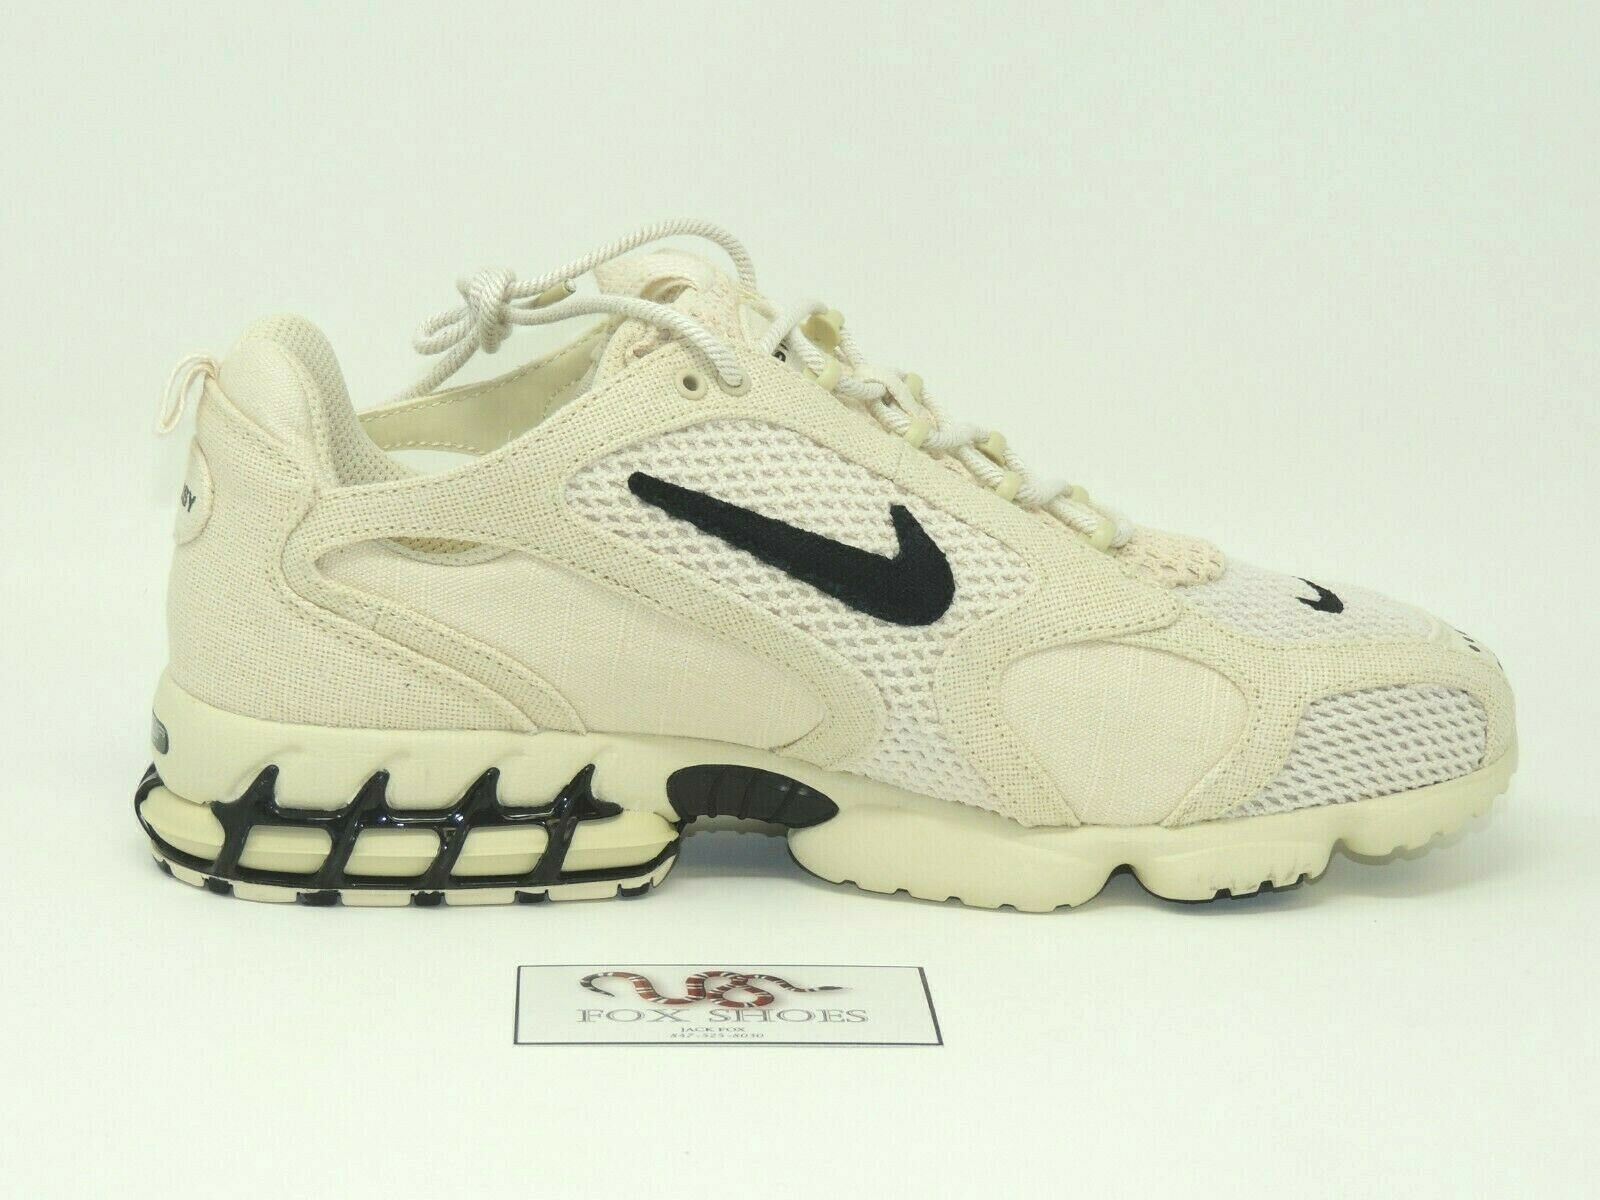 Nike x Stussy Air Zoom Spiridon Cage 2 Fossil Tan - Size 13 Men's - 뉴 RARE